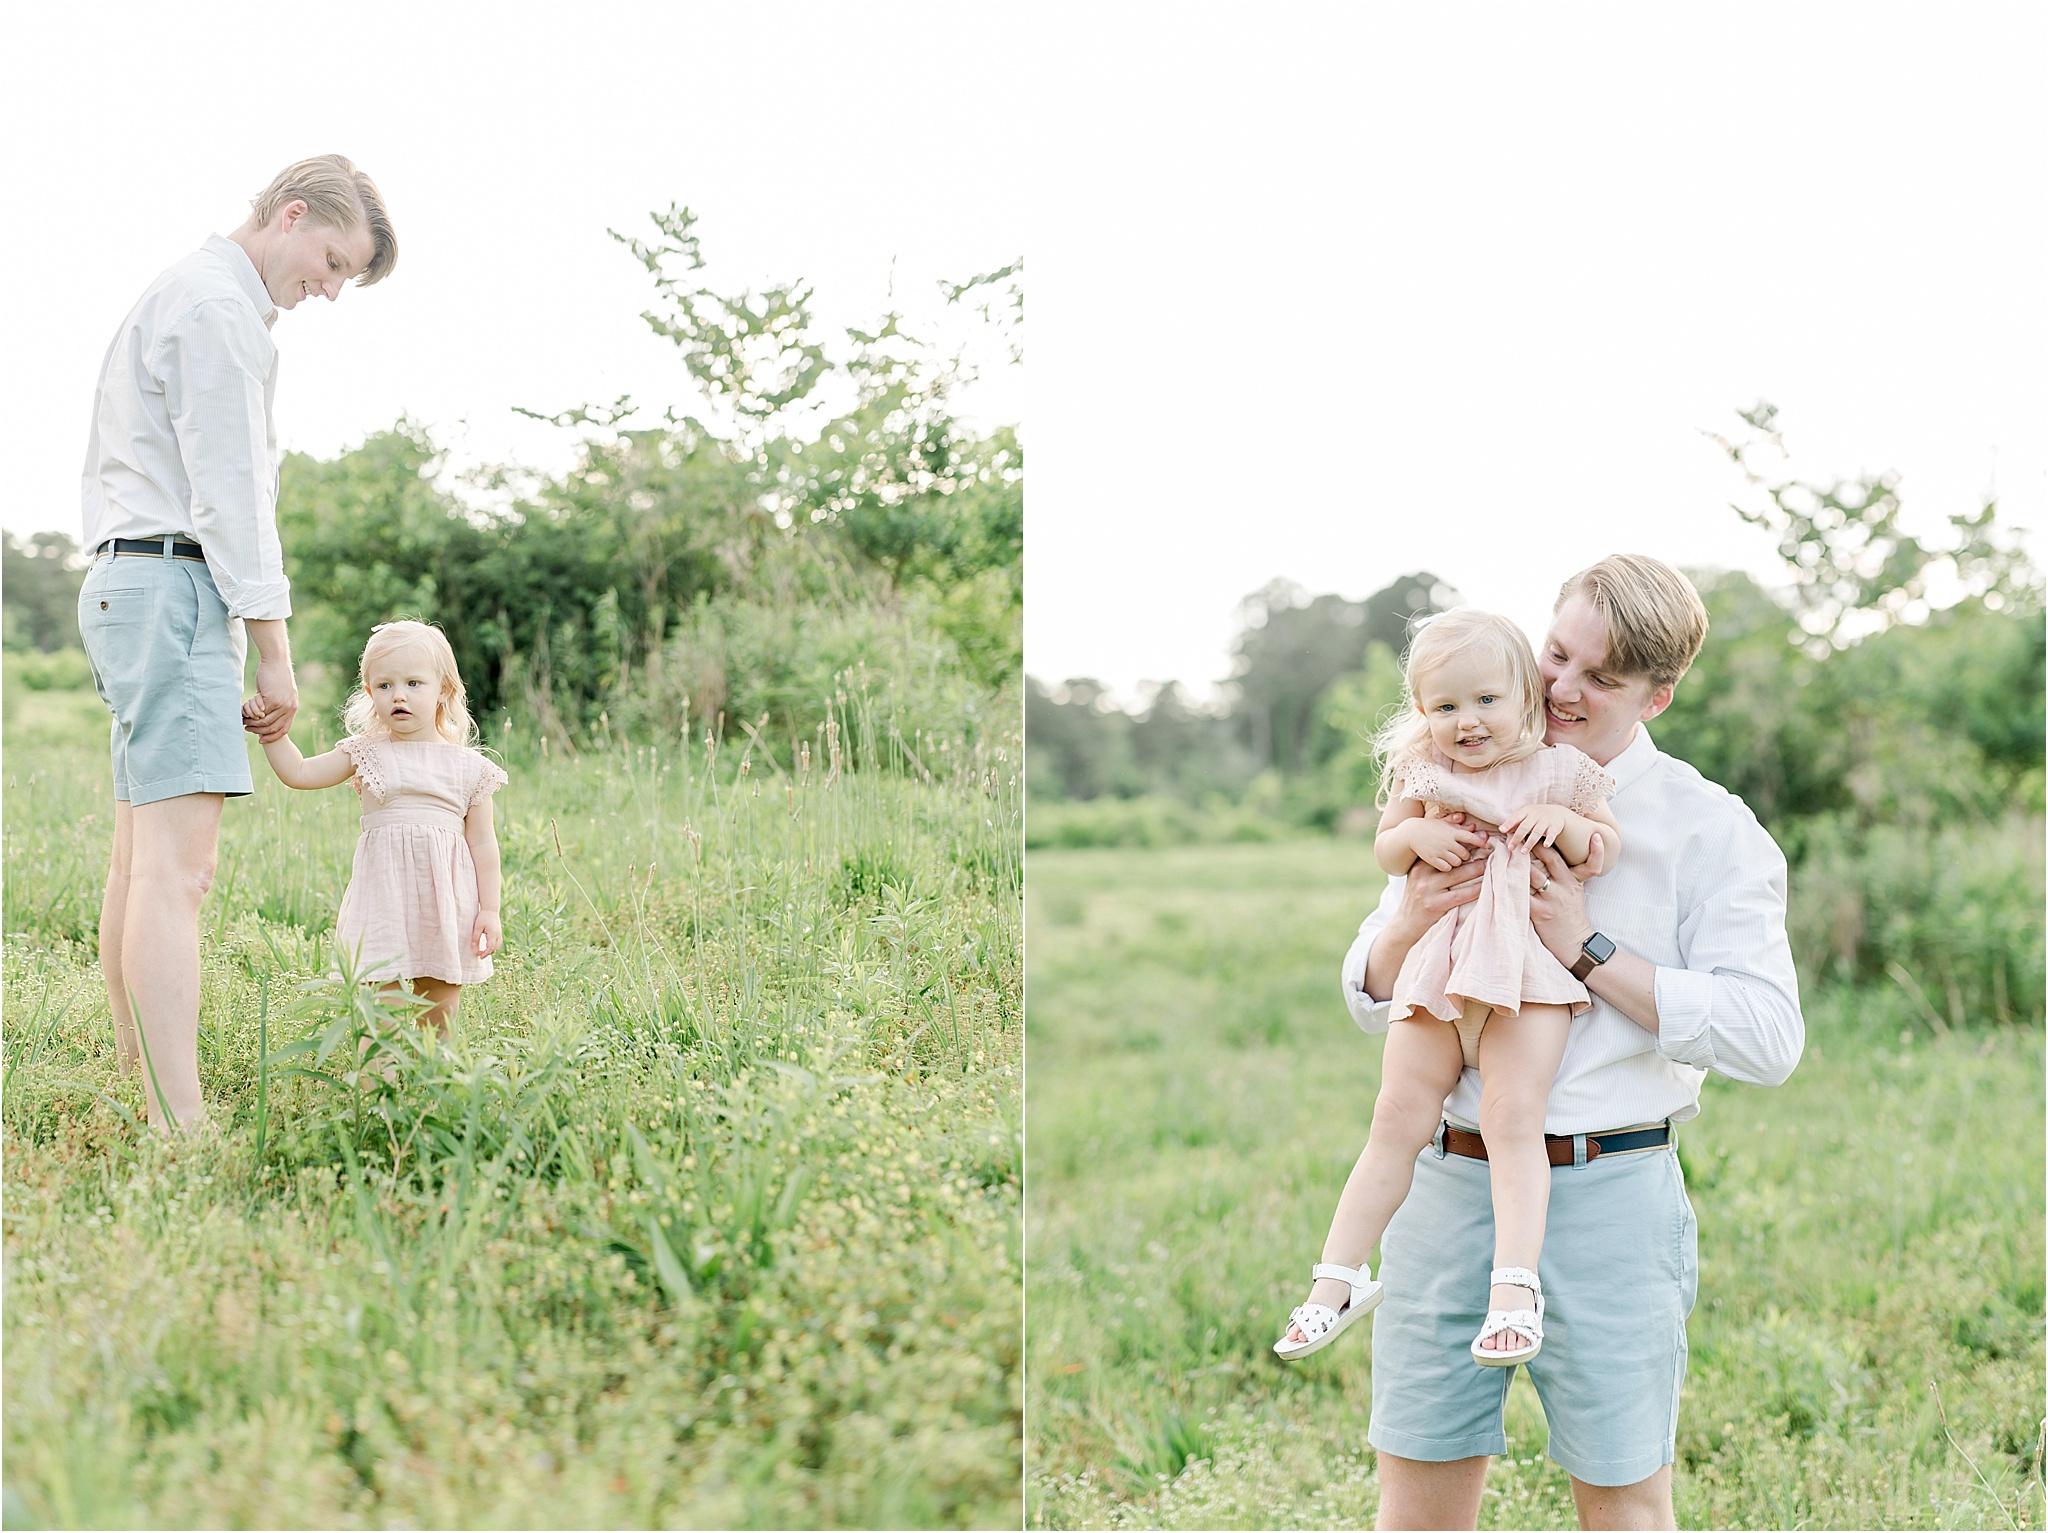 Rachel_Bond_Birmingham_AL-family-photography_0004.jpg